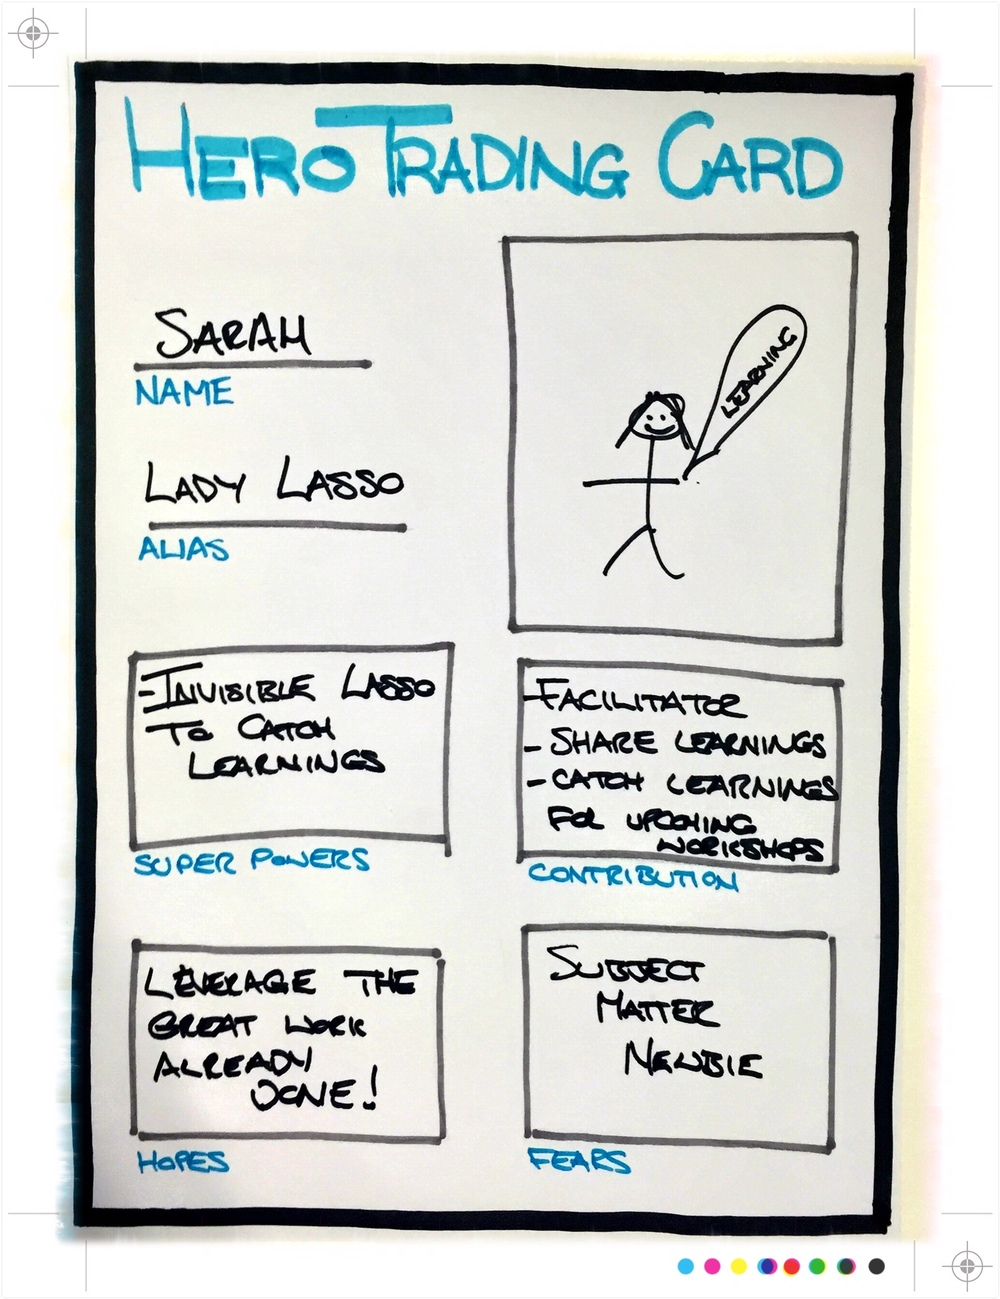 Hero Trading Card Sarah